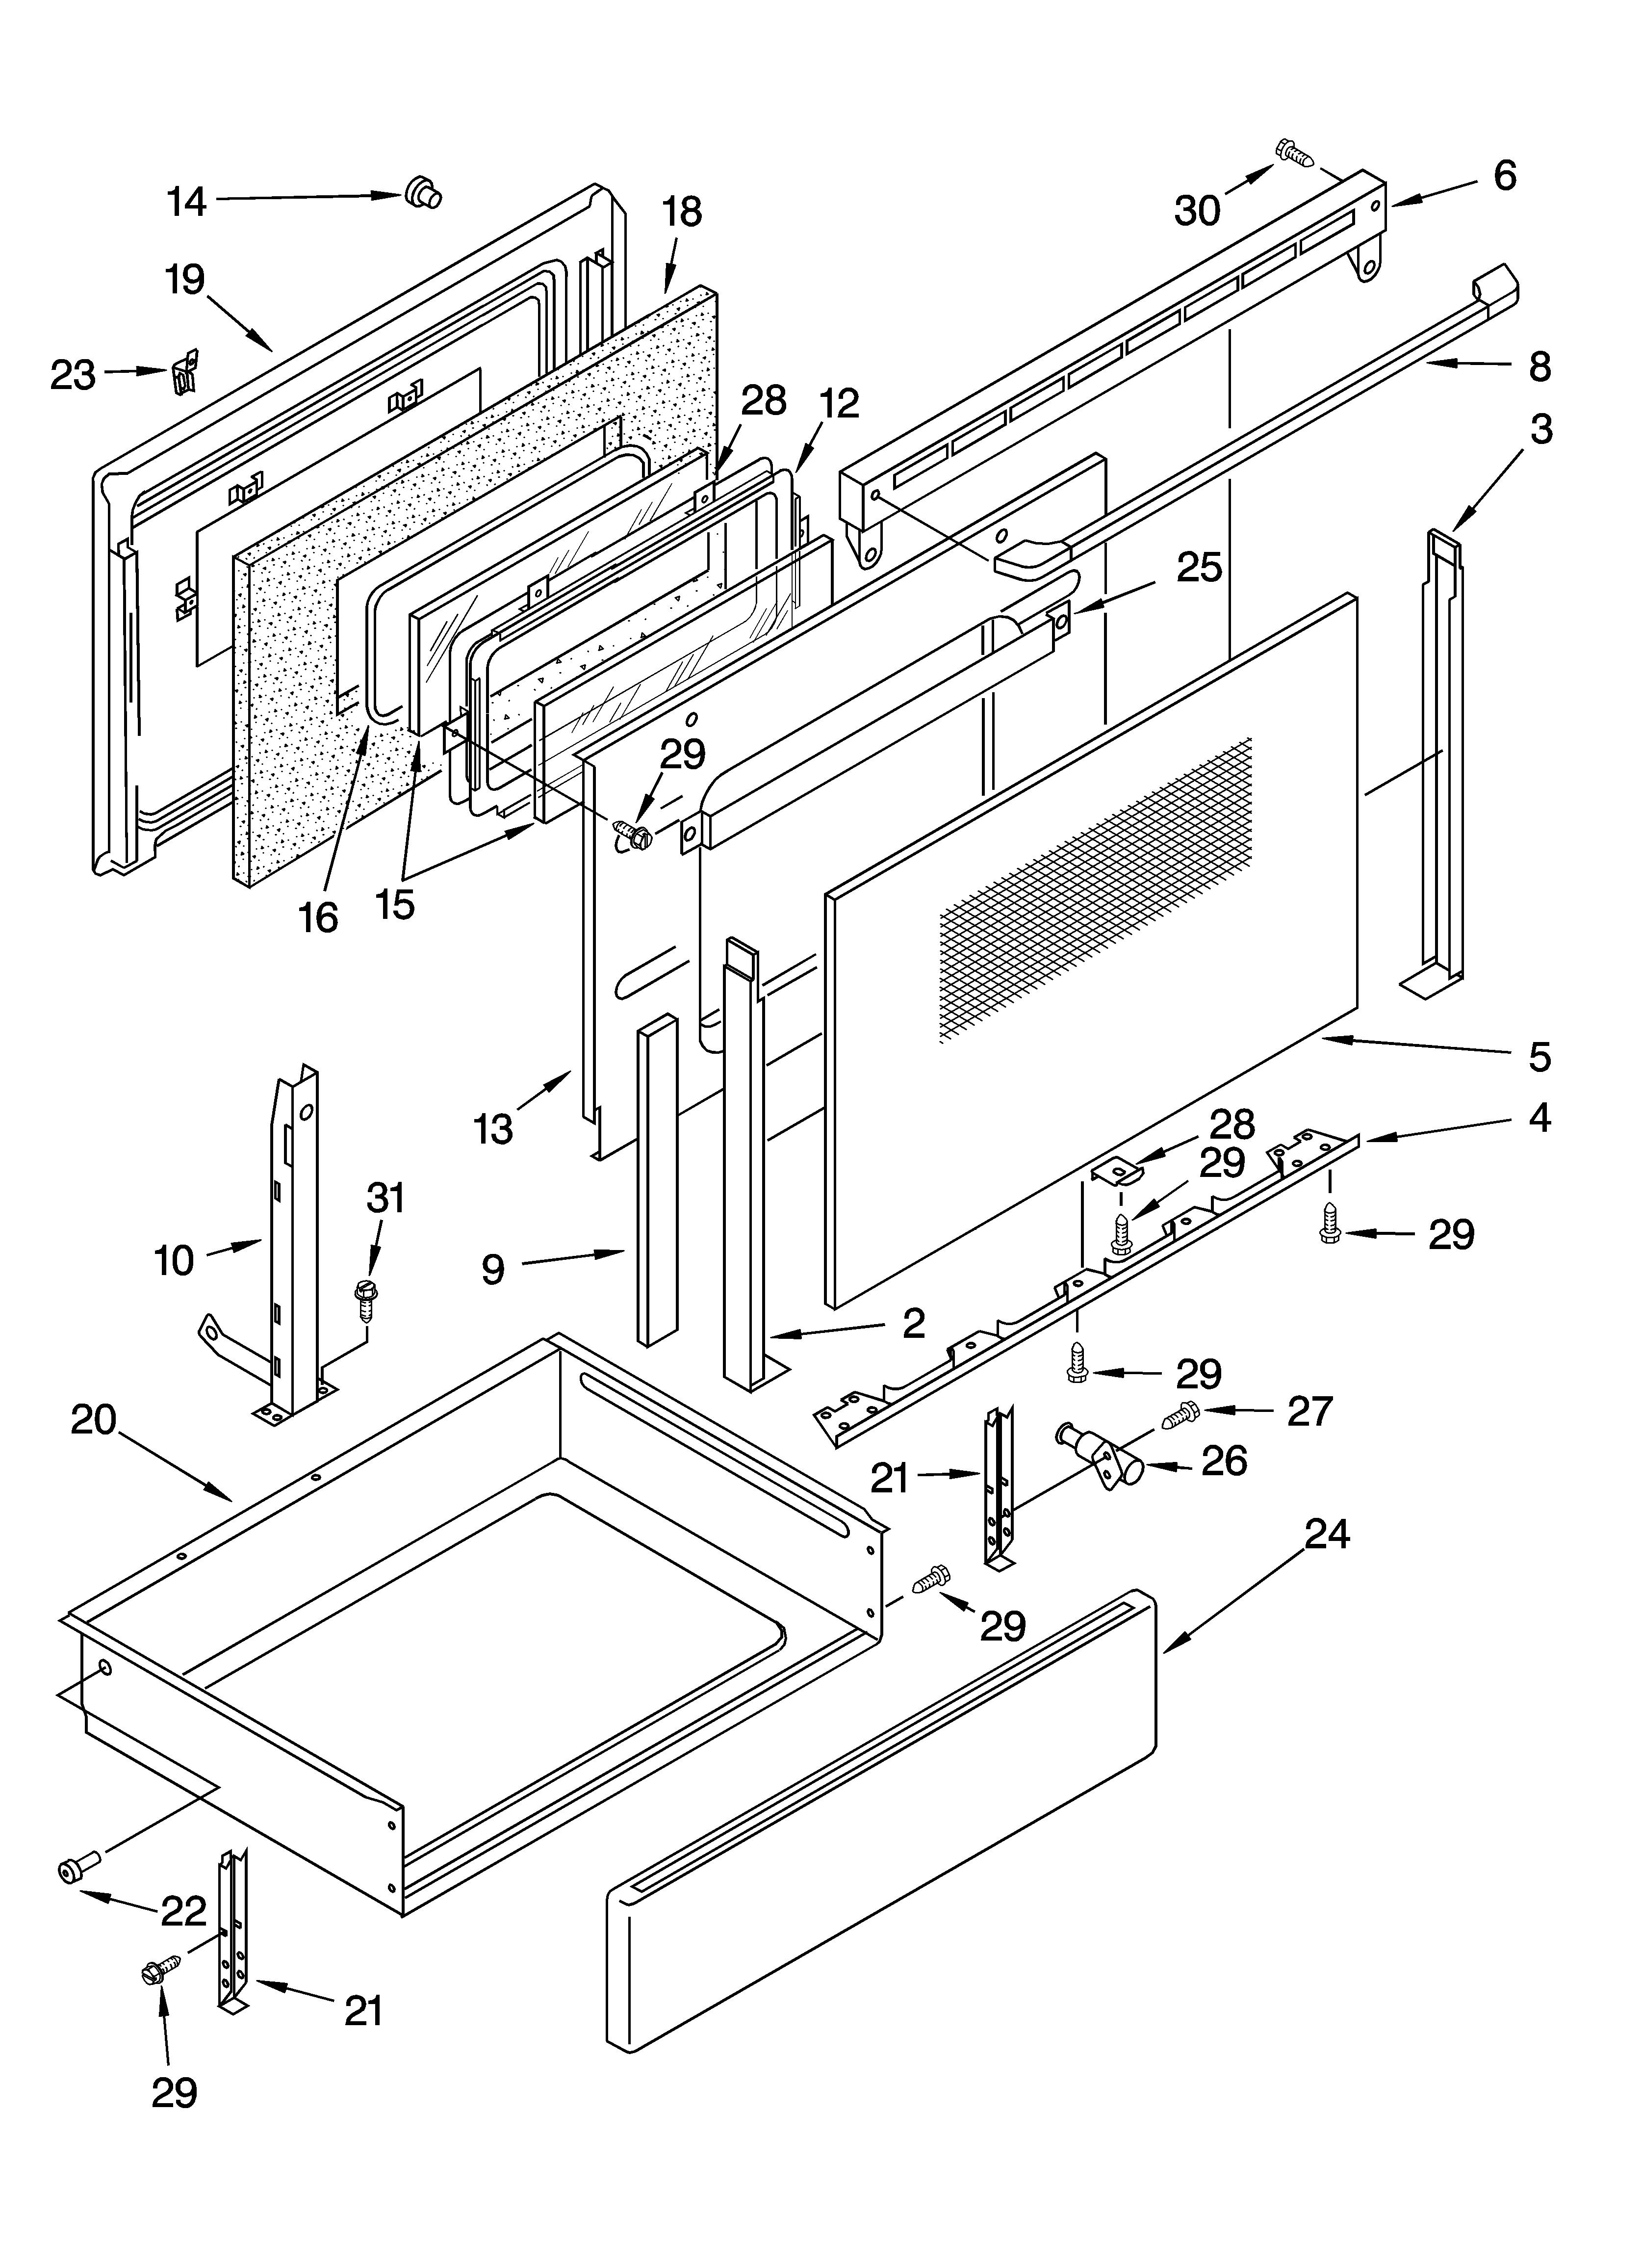 FH_9229] Whirlpool Range Surface Element Wiring Diagram Download DiagramFeren Geis Phae Mohammedshrine Librar Wiring 101